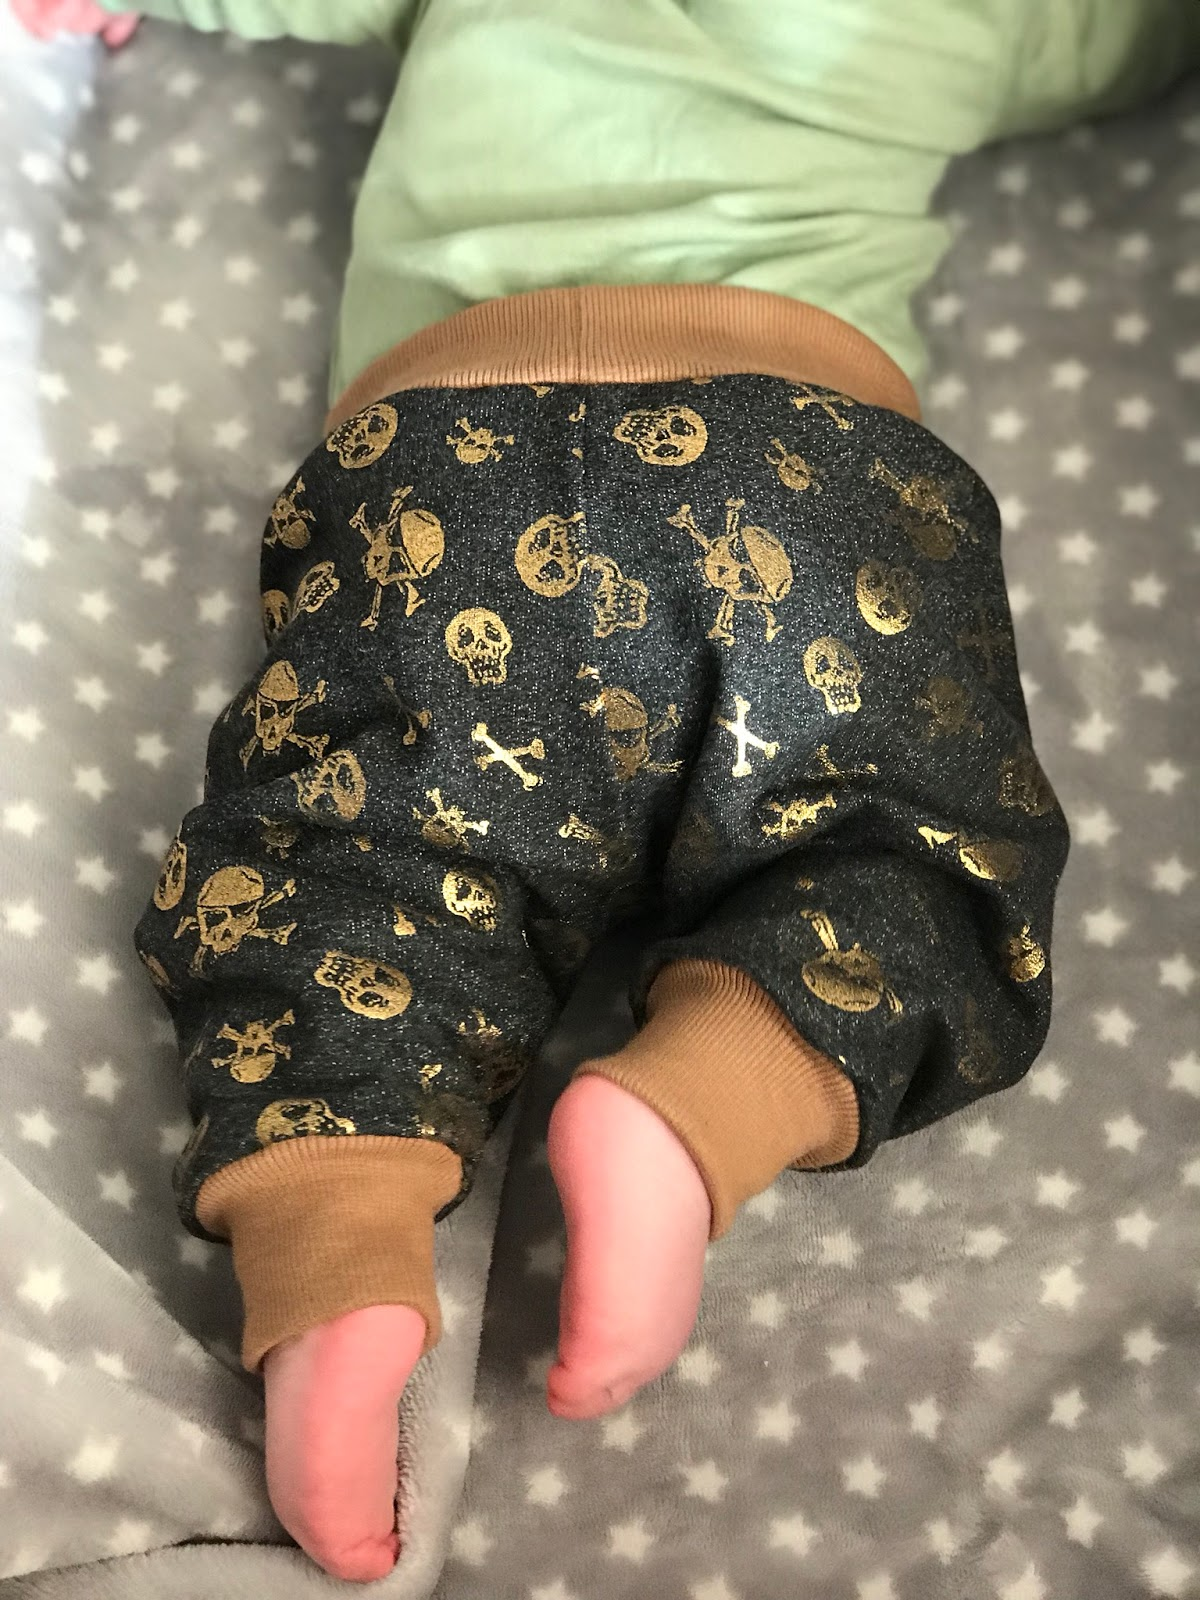 alles-selbstgenaeht : Anleitung Babyhose nähen, Variante 2